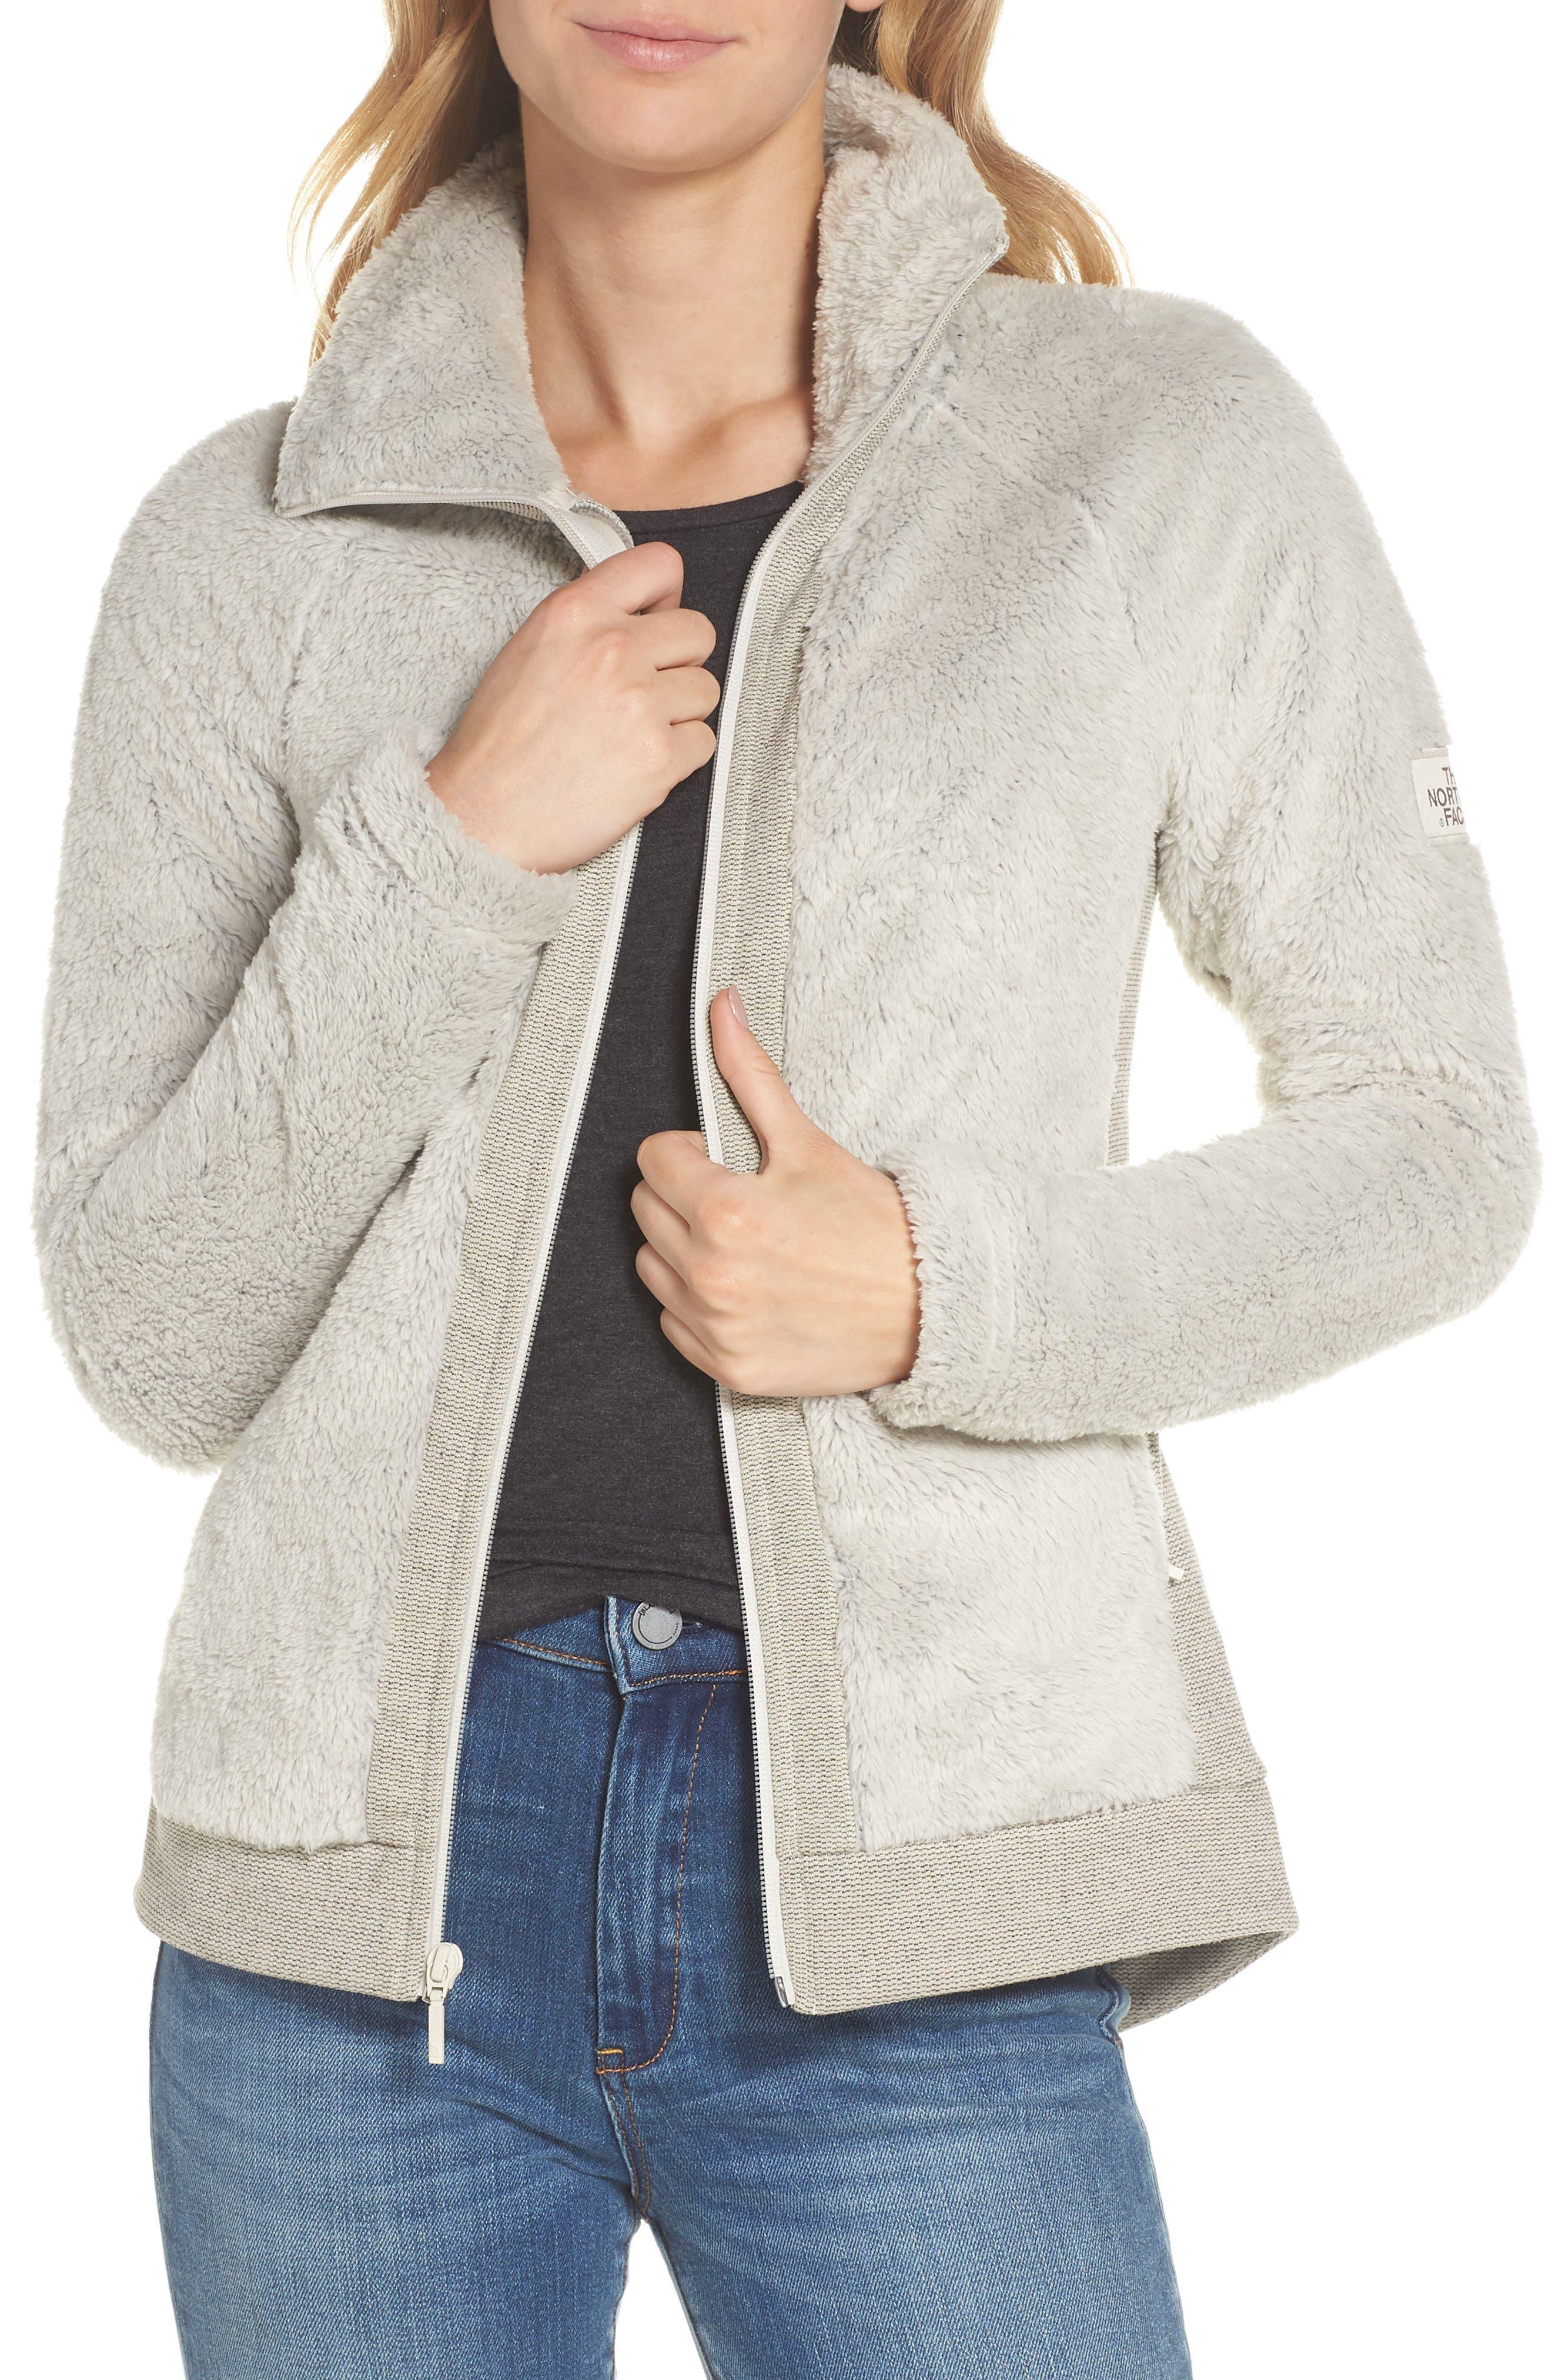 THE NORTH FACE, Furry Fleece Jacket, Main thumbnail 1, color, VINTAGE WHITE